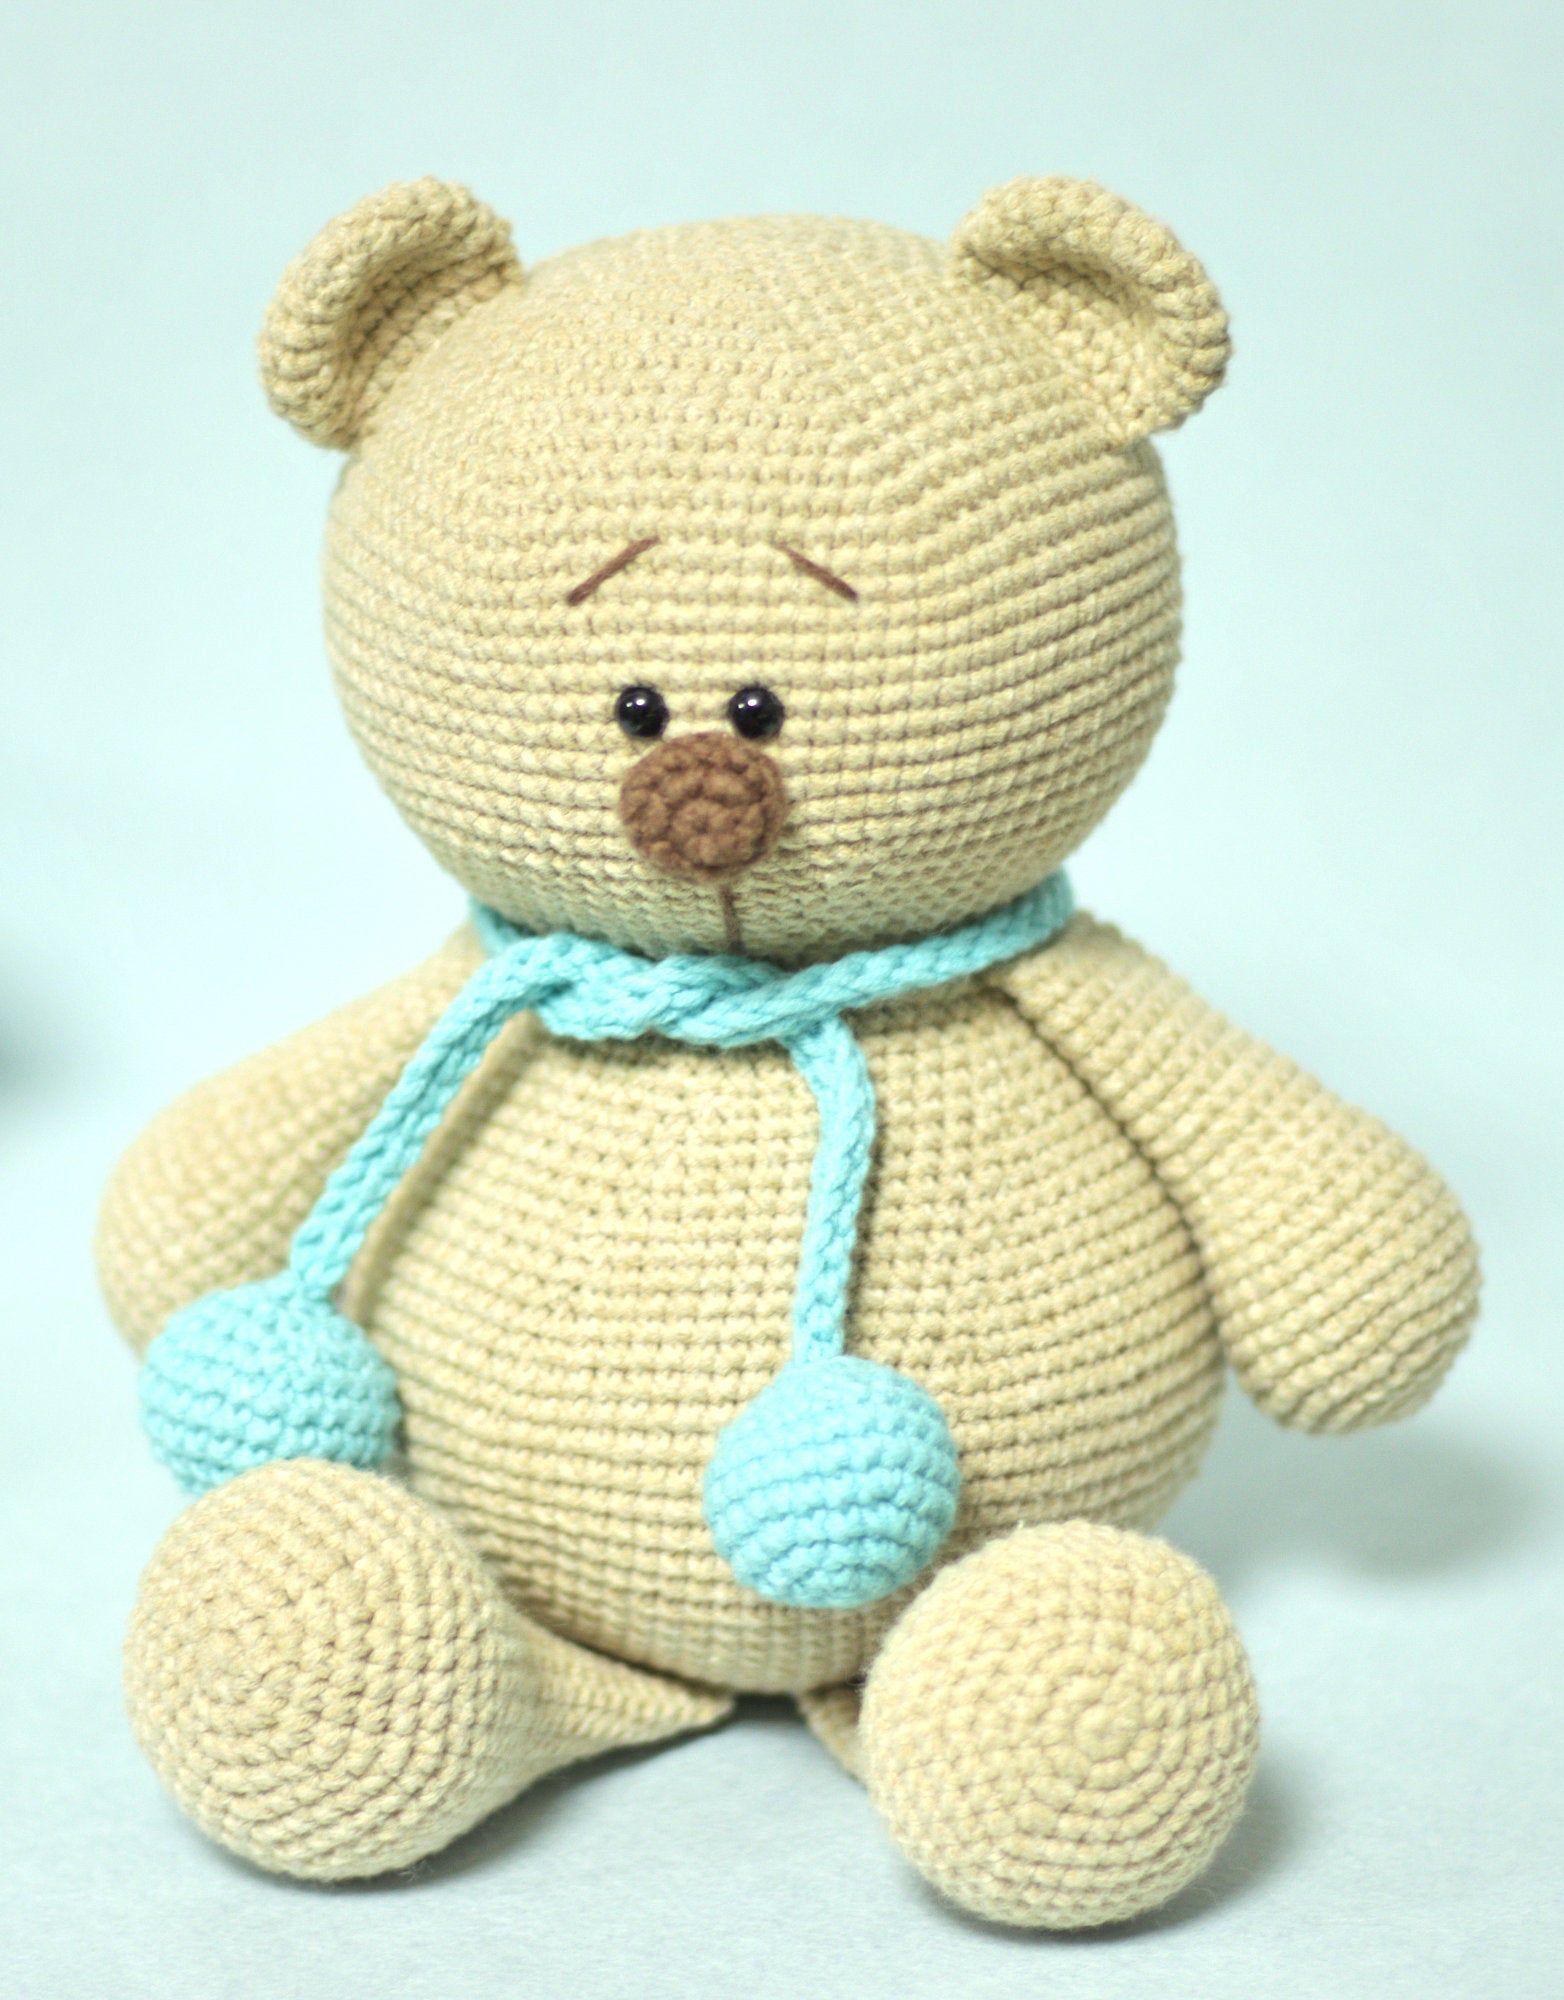 Items similar to Crochet bear toy , stuffed teddy bear , amigurumi bear toy, soft toy, plush toy for cuddling , Mother's Day gift , Baby shower on Etsy #beartoy